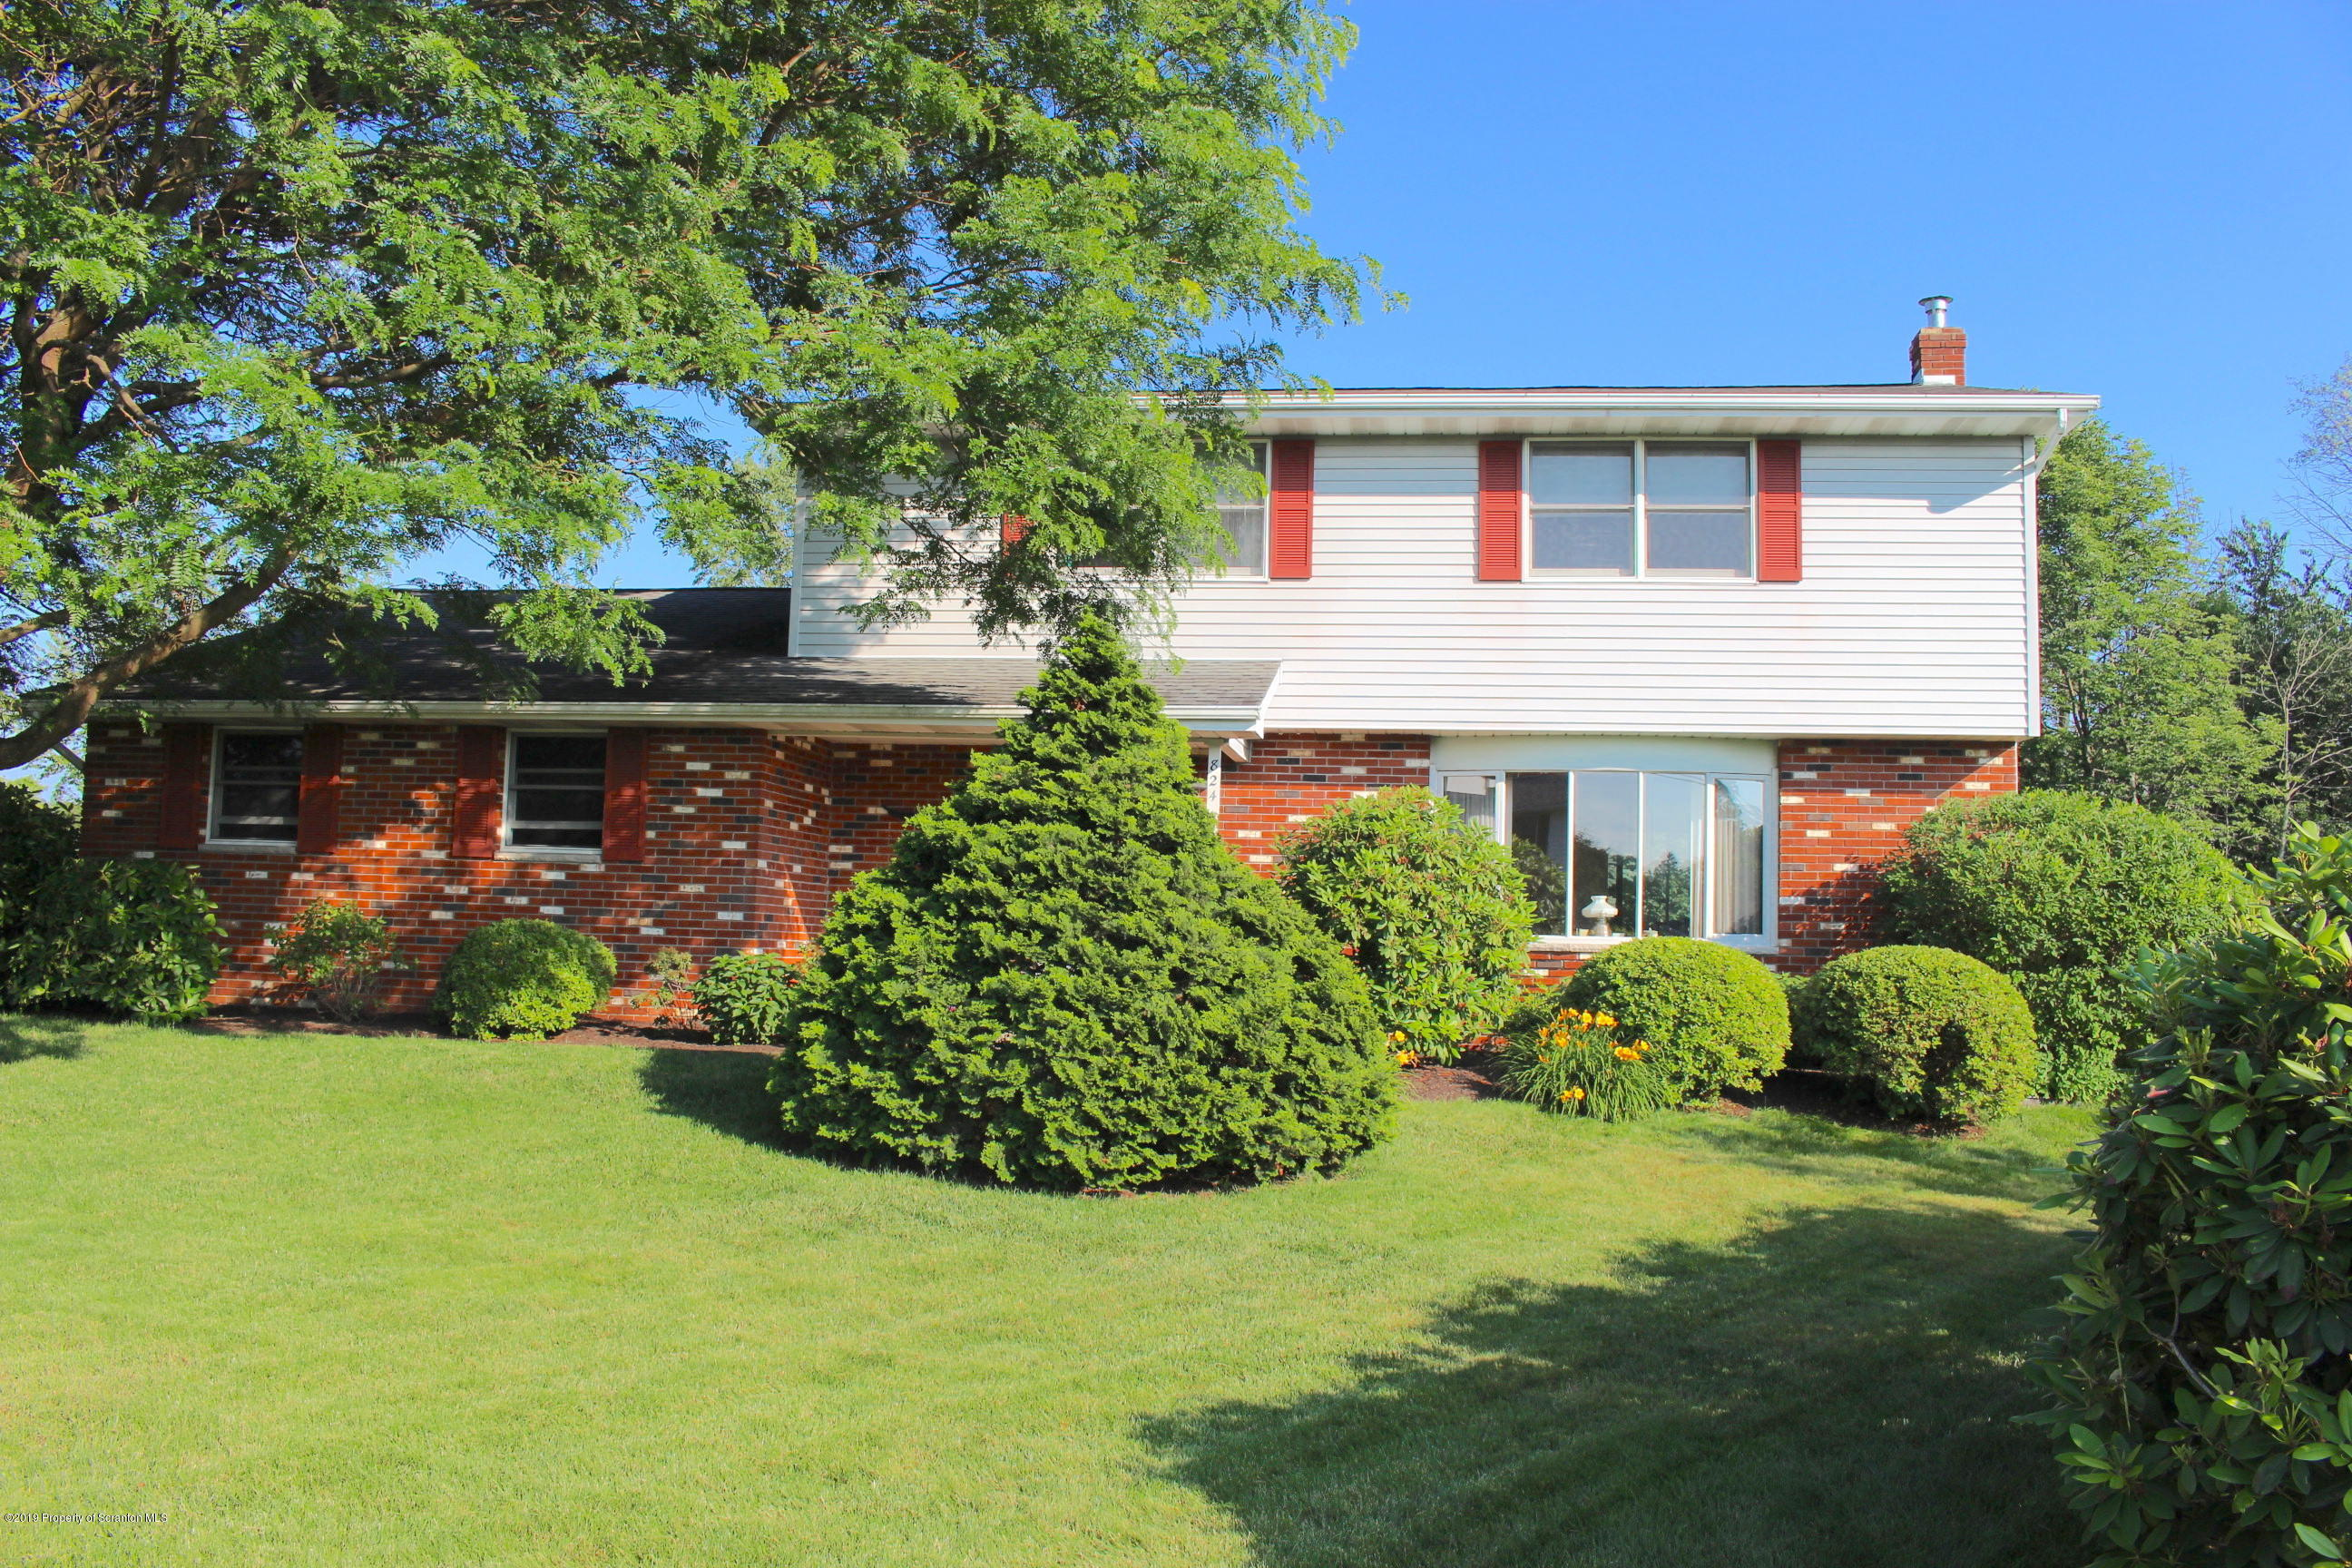 824 Laconia Cir, South Abington Twp, Pennsylvania 18411, 4 Bedrooms Bedrooms, 8 Rooms Rooms,3 BathroomsBathrooms,Single Family,For Sale,Laconia,19-3381